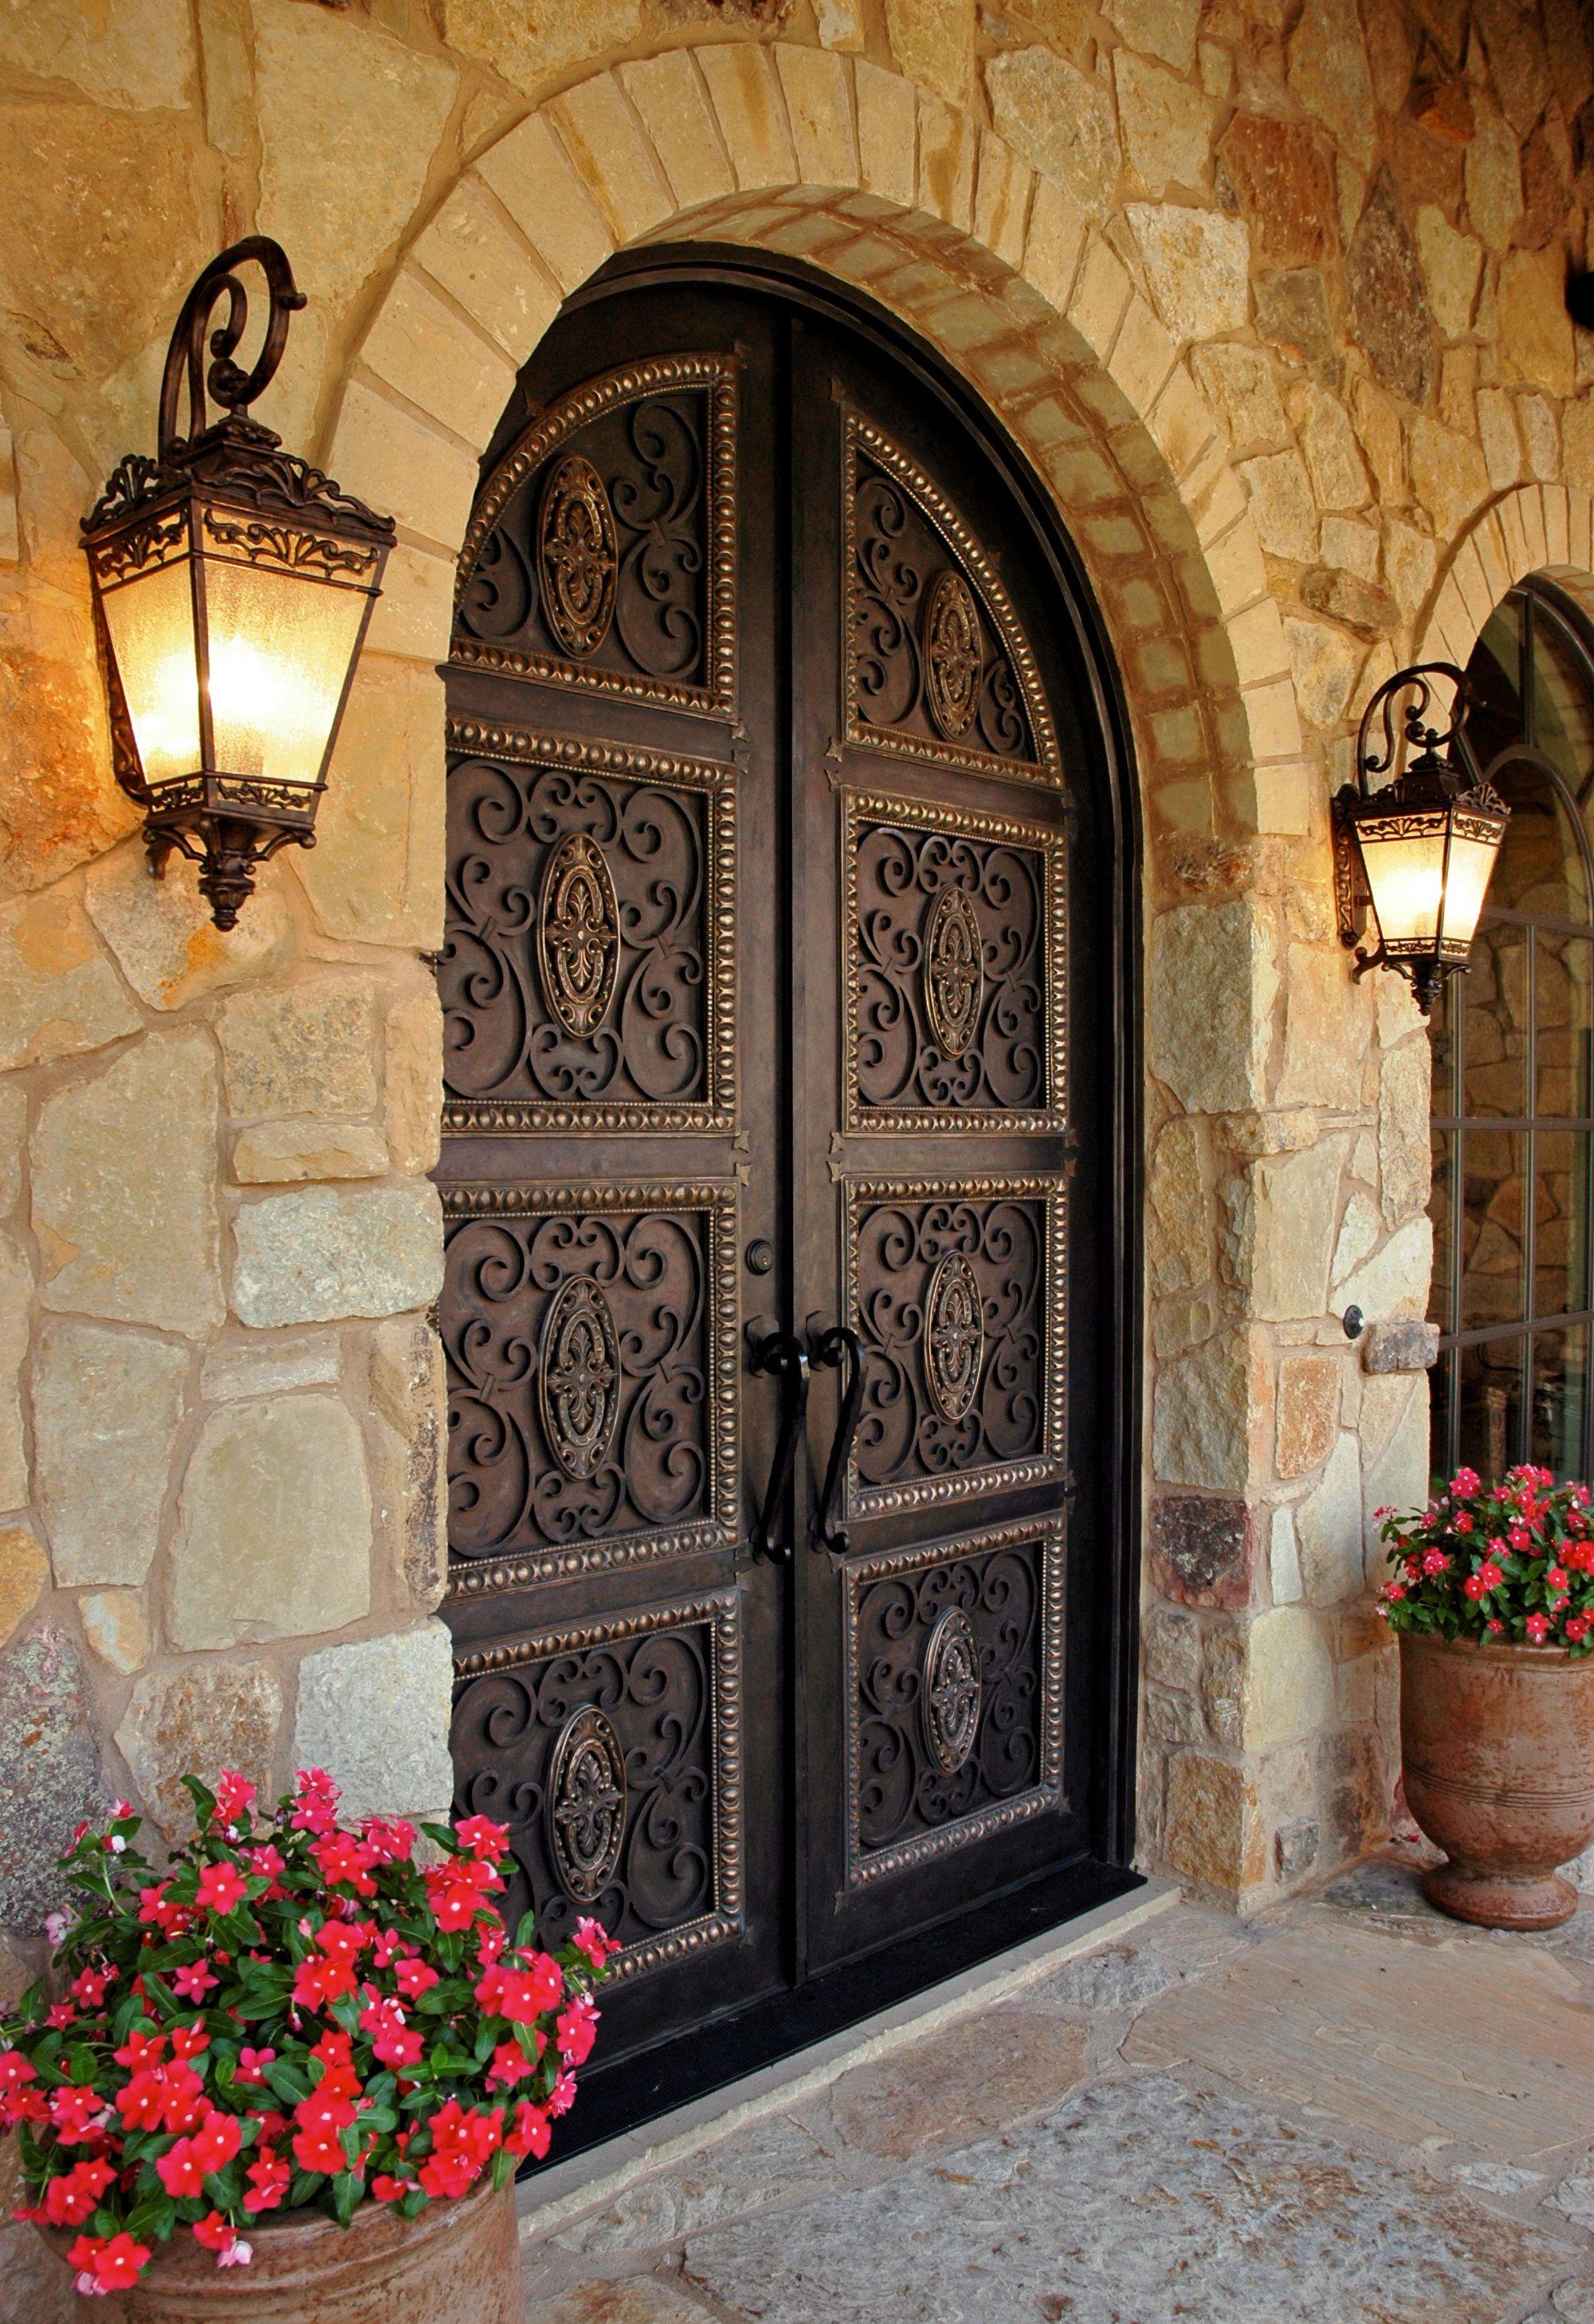 Roughtiron Front Doors And Connecticut Now Got Grander With Hand Forged Wrought Iron Doors Mediterranean Front Doors Beautiful Doors House Design